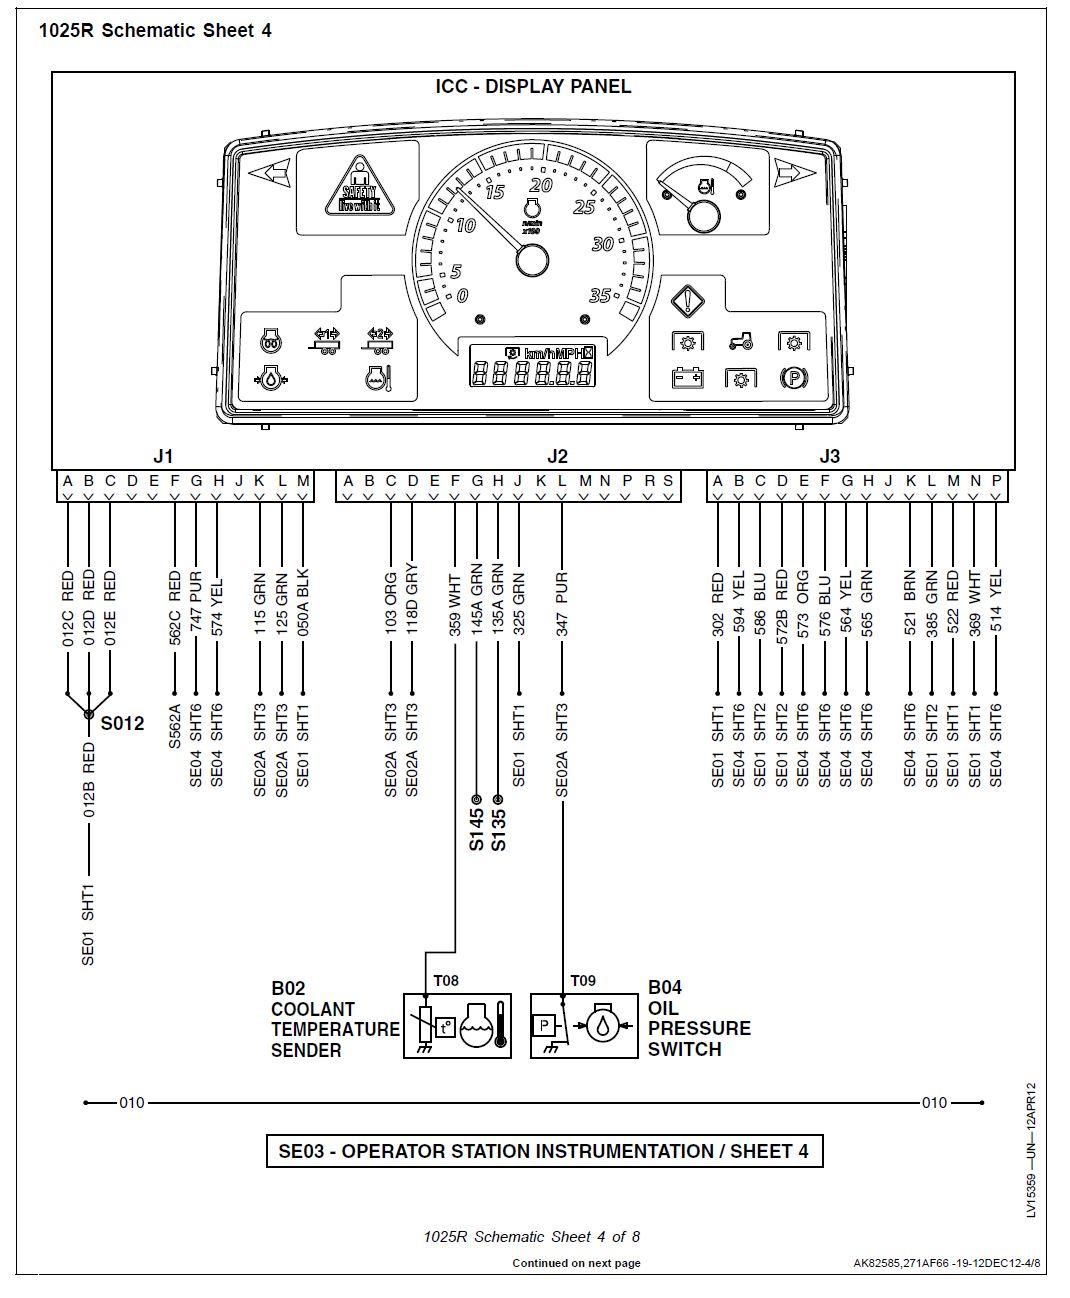 1025R ICC wire Diagram.JPG